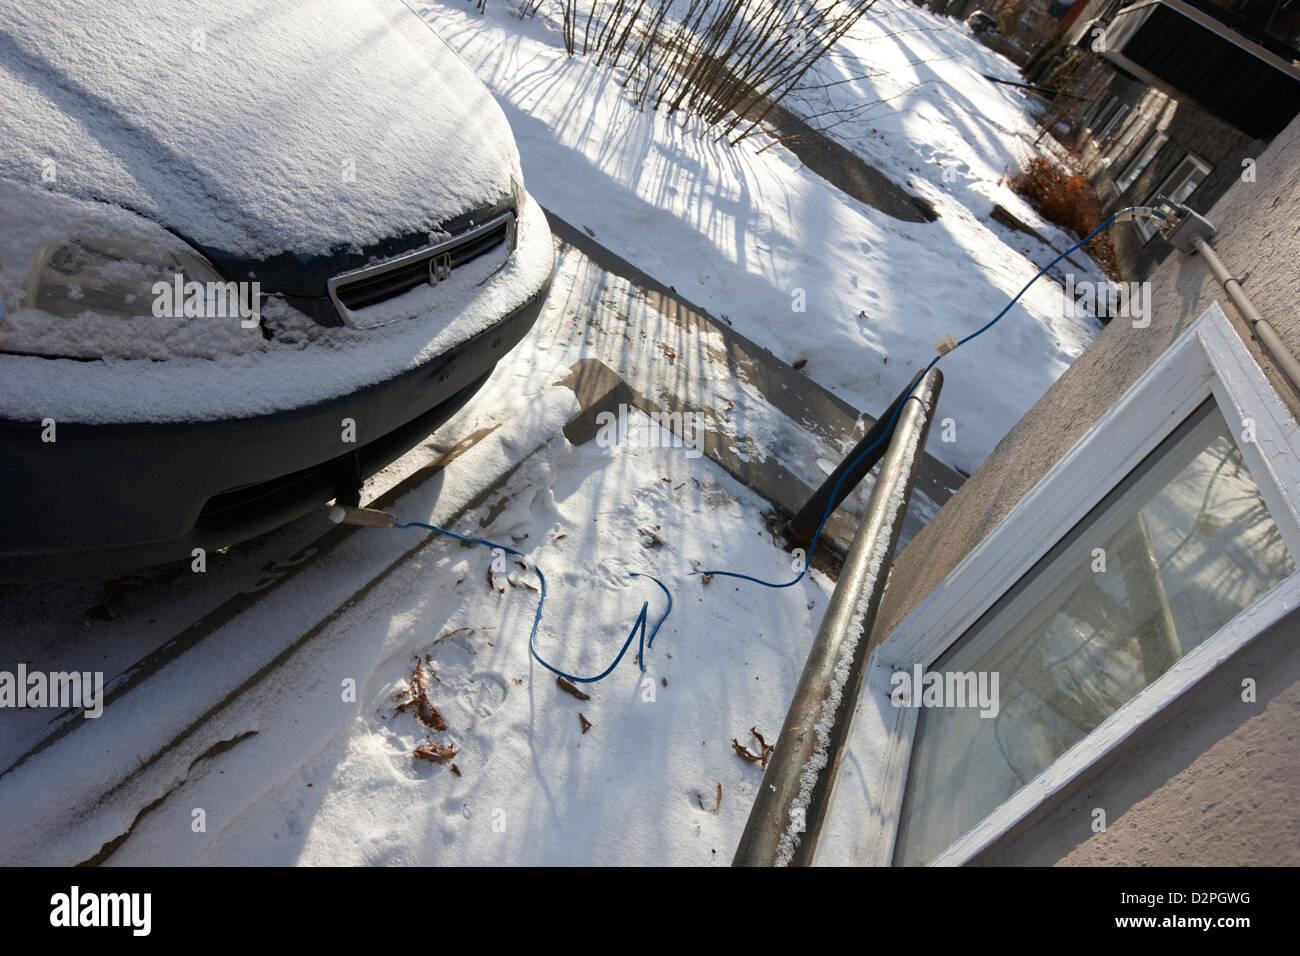 external power outlet connected to engine block heater of frozen car outside building in Saskatoon Saskatchewan - Stock Image